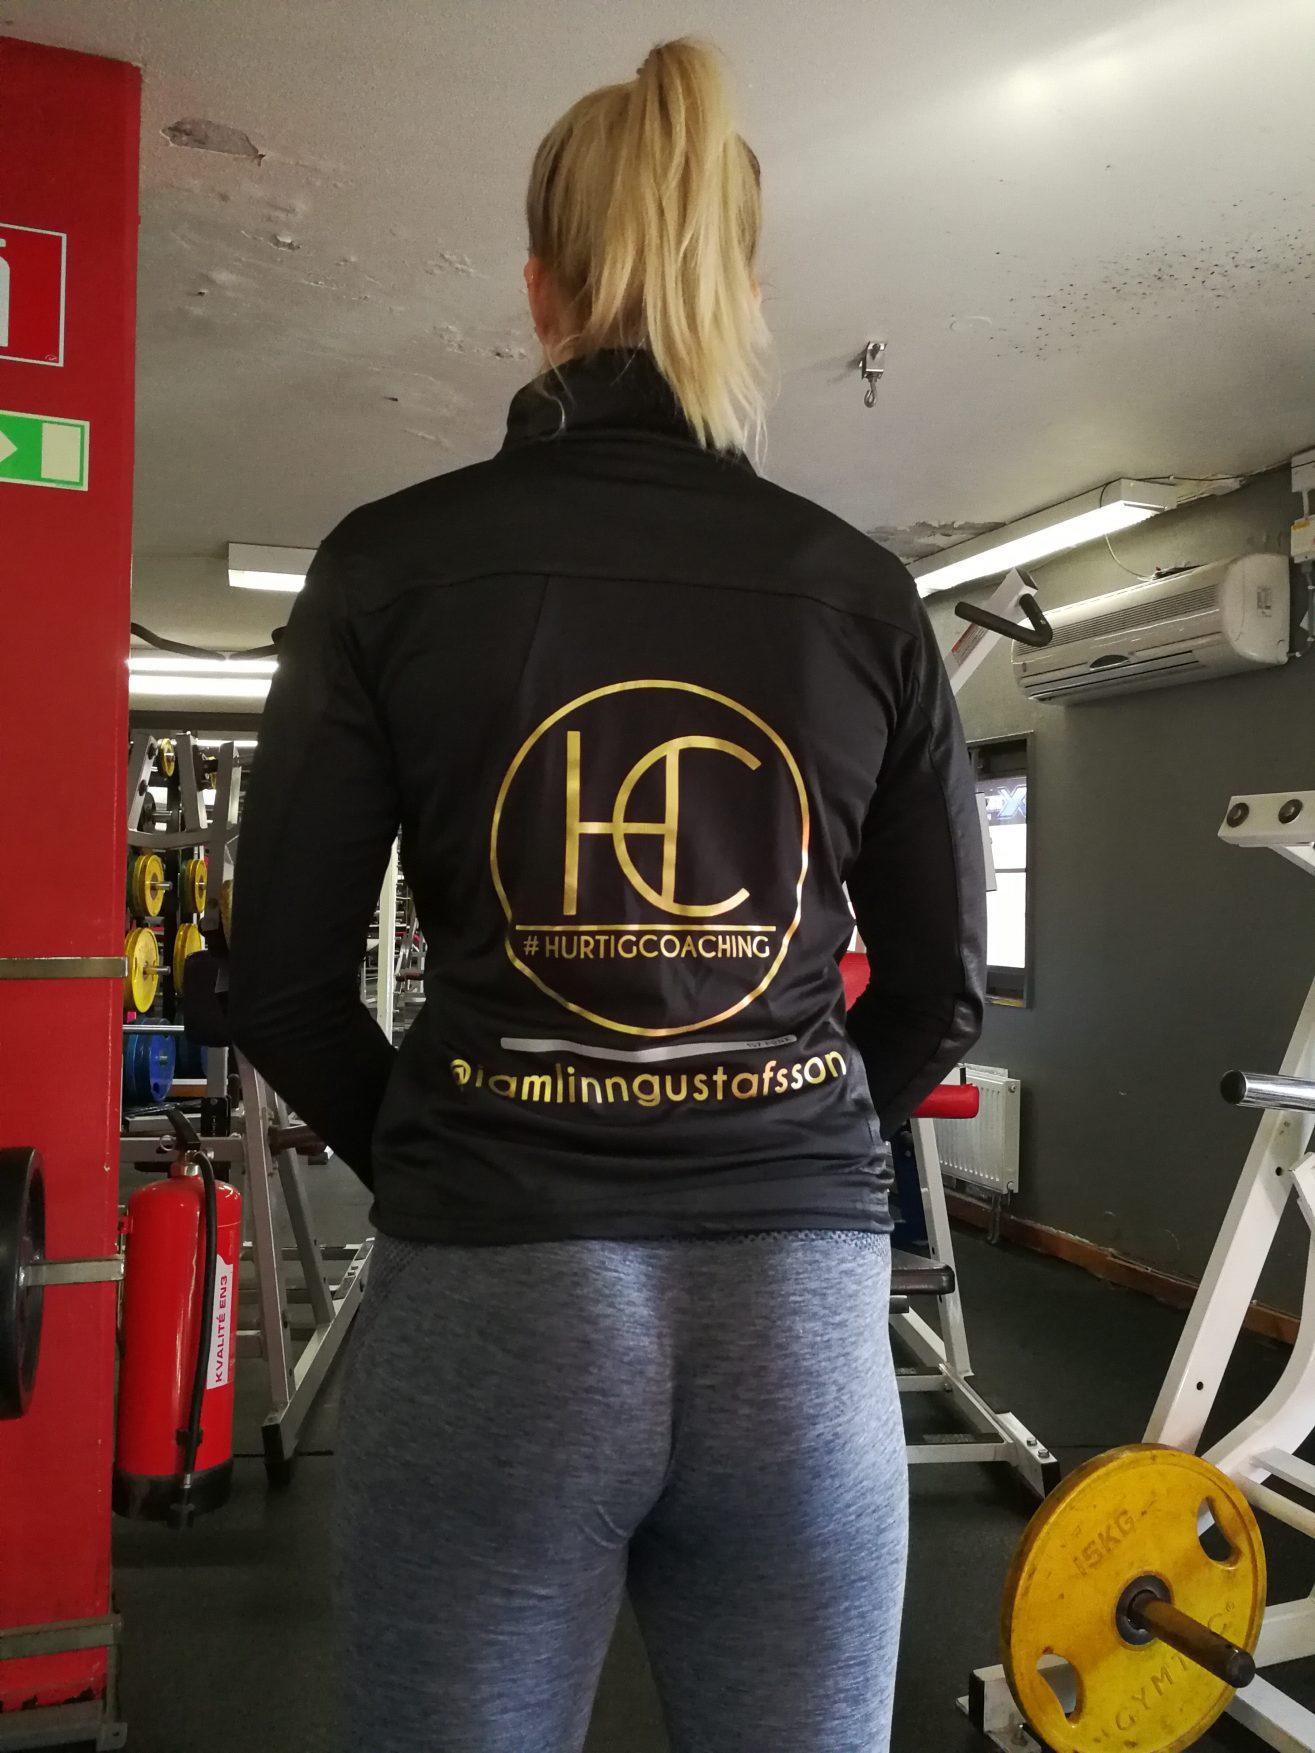 Linn Gustafsson Fitness fashion Göteborg Alexander HurtigLinn Gustafsson Fitness fashion Göteborg Alexander Hurtig